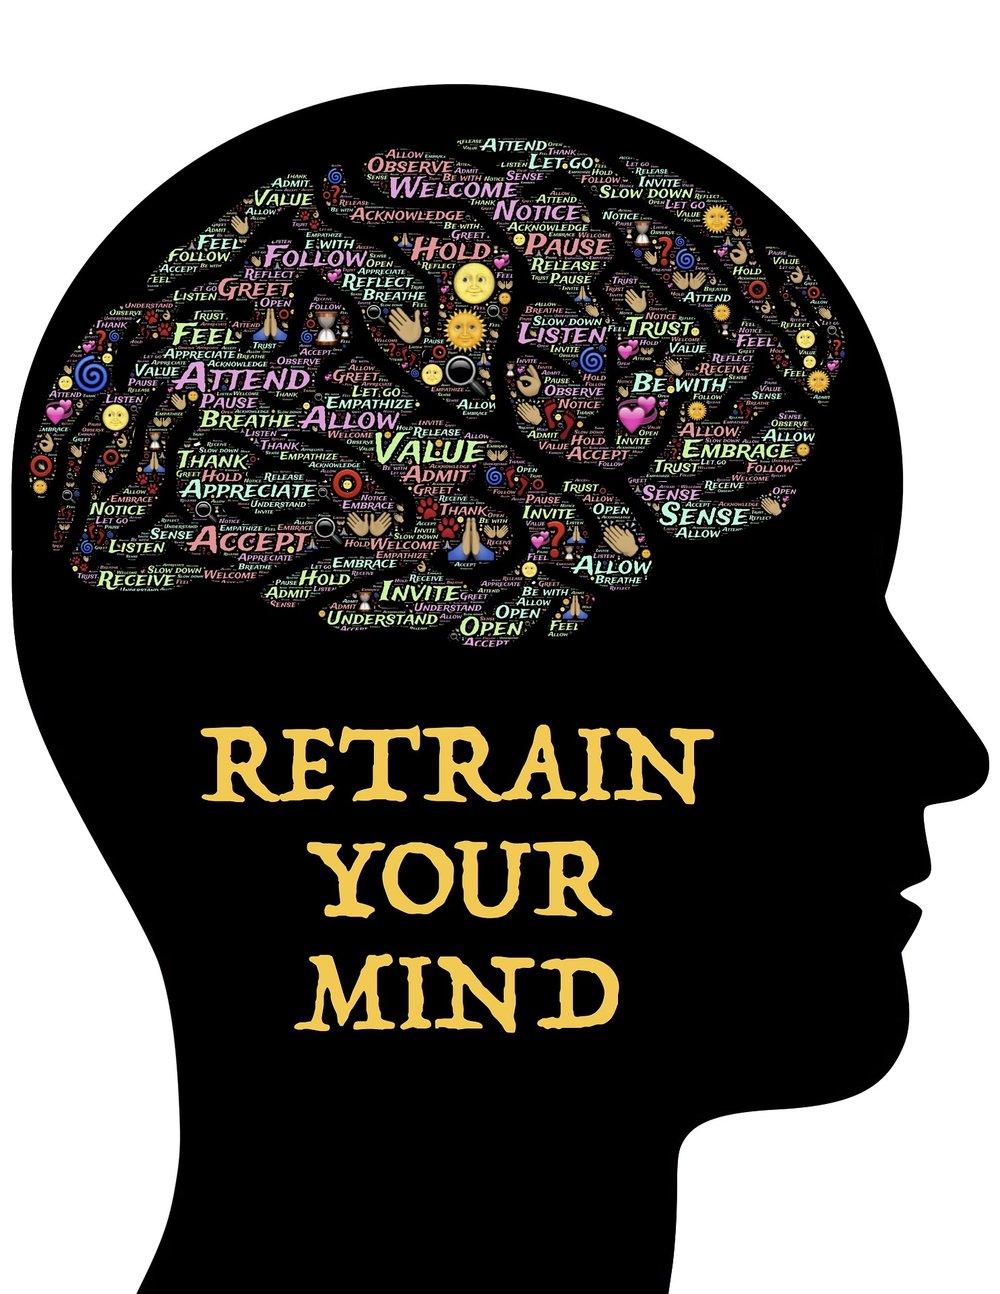 mindset-743166_1920.jpg